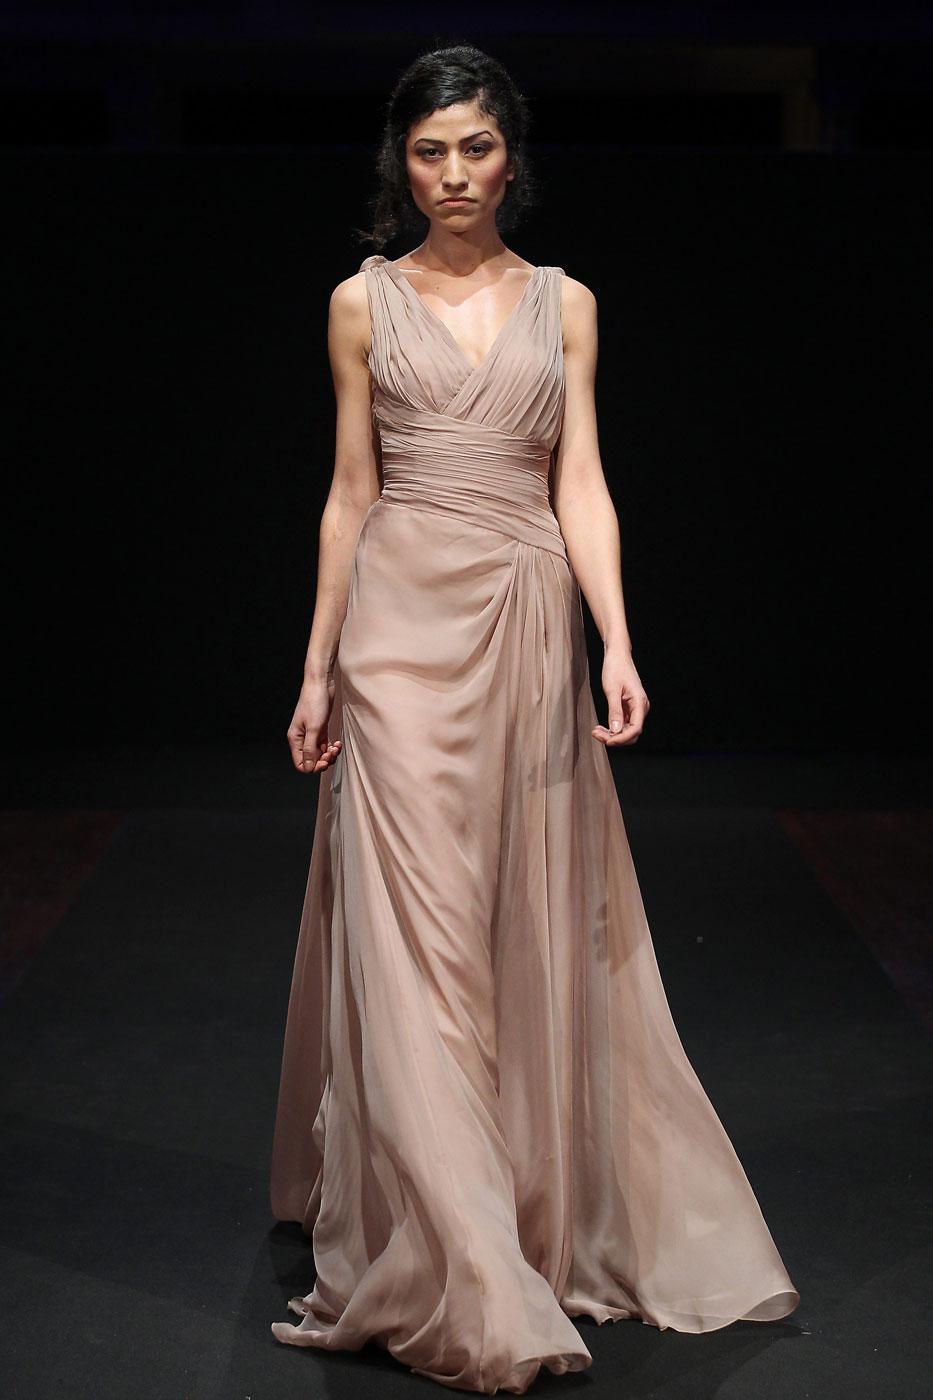 Abed-Mahfouz-fashion-runway-show-haute-couture-paris-spring-2015-the-impression-26